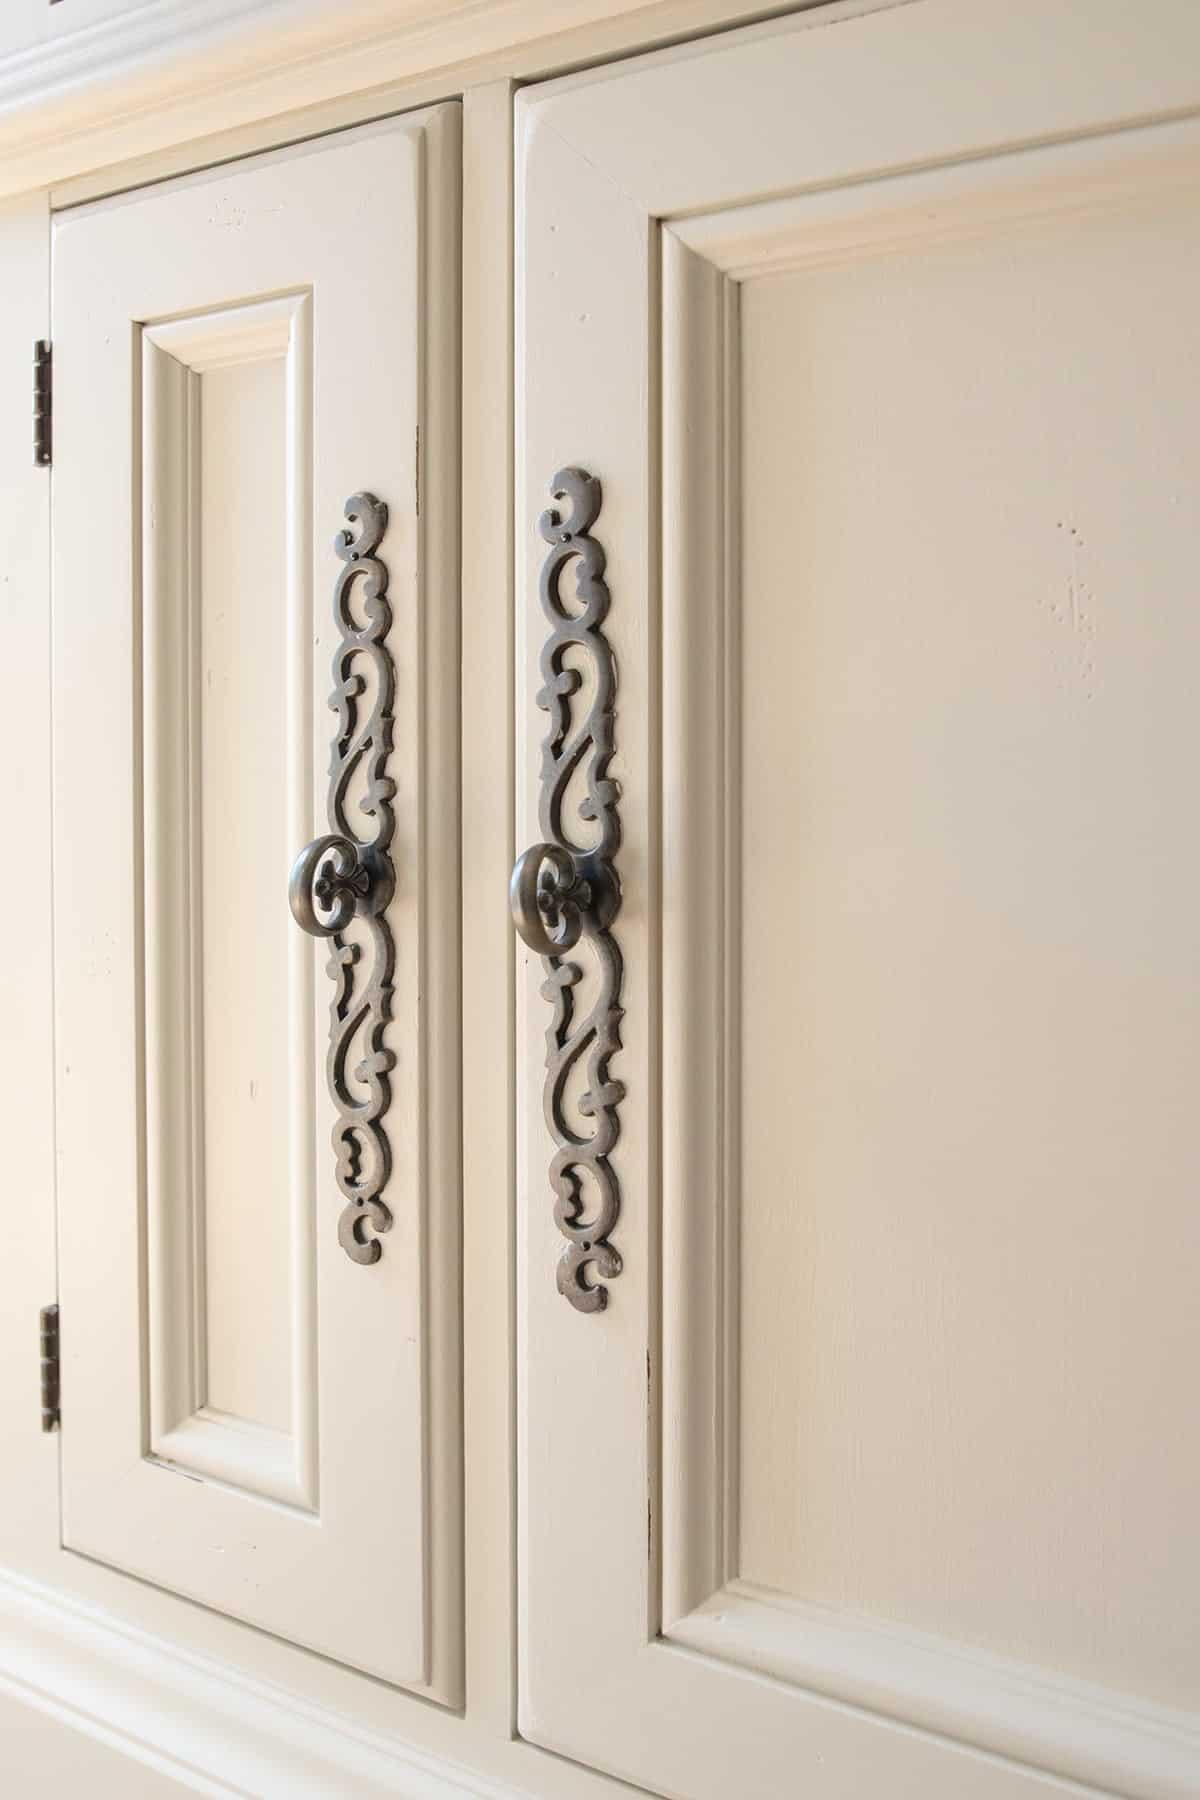 doors-with-ornate-handles-entertainment-center-hooker